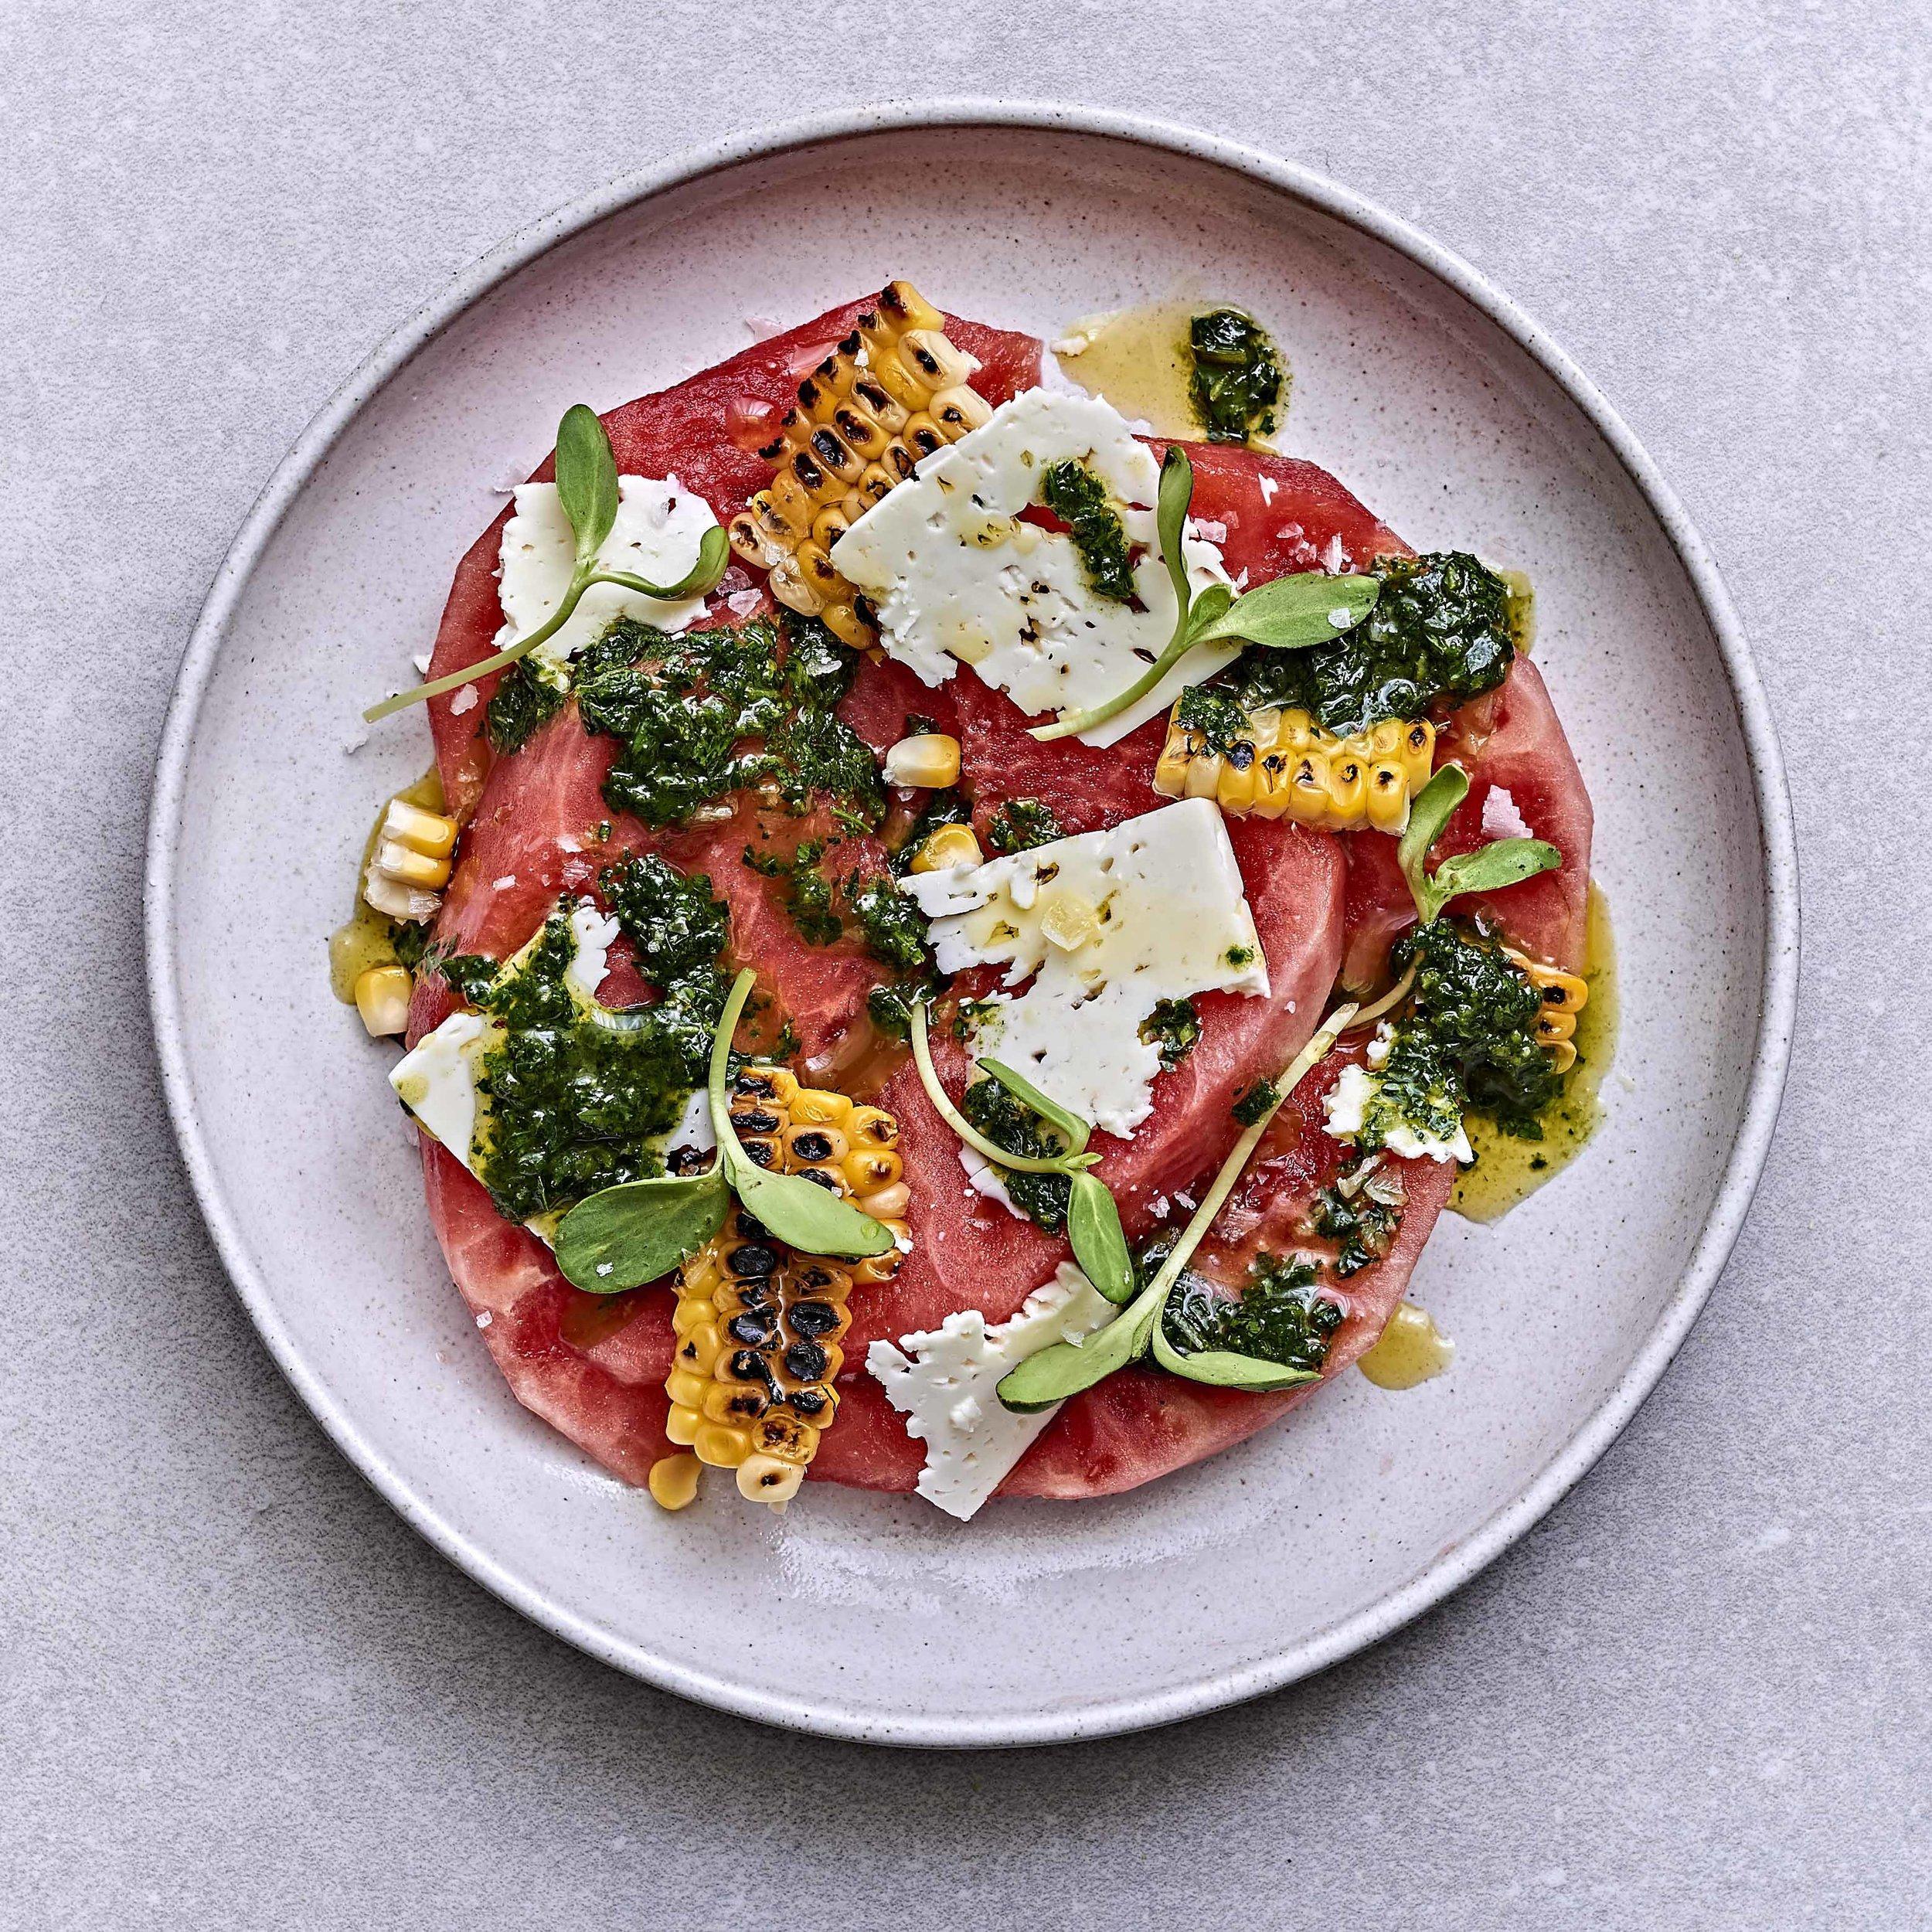 Watermelon, Charred Corn, Feta & Spiced Basil Oil by Chef Mike Ward